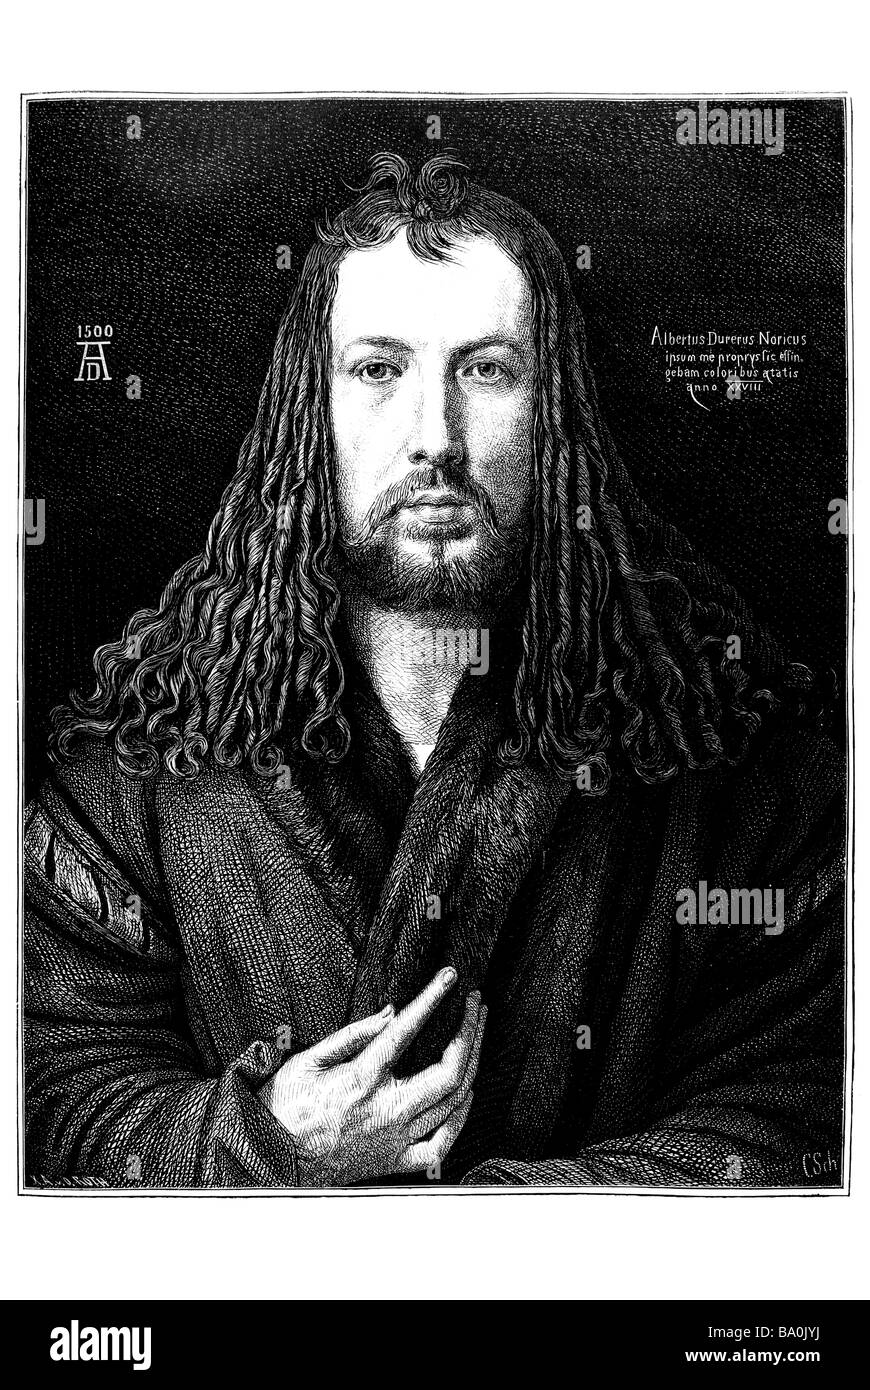 Albrecht Dürer - Stock Image